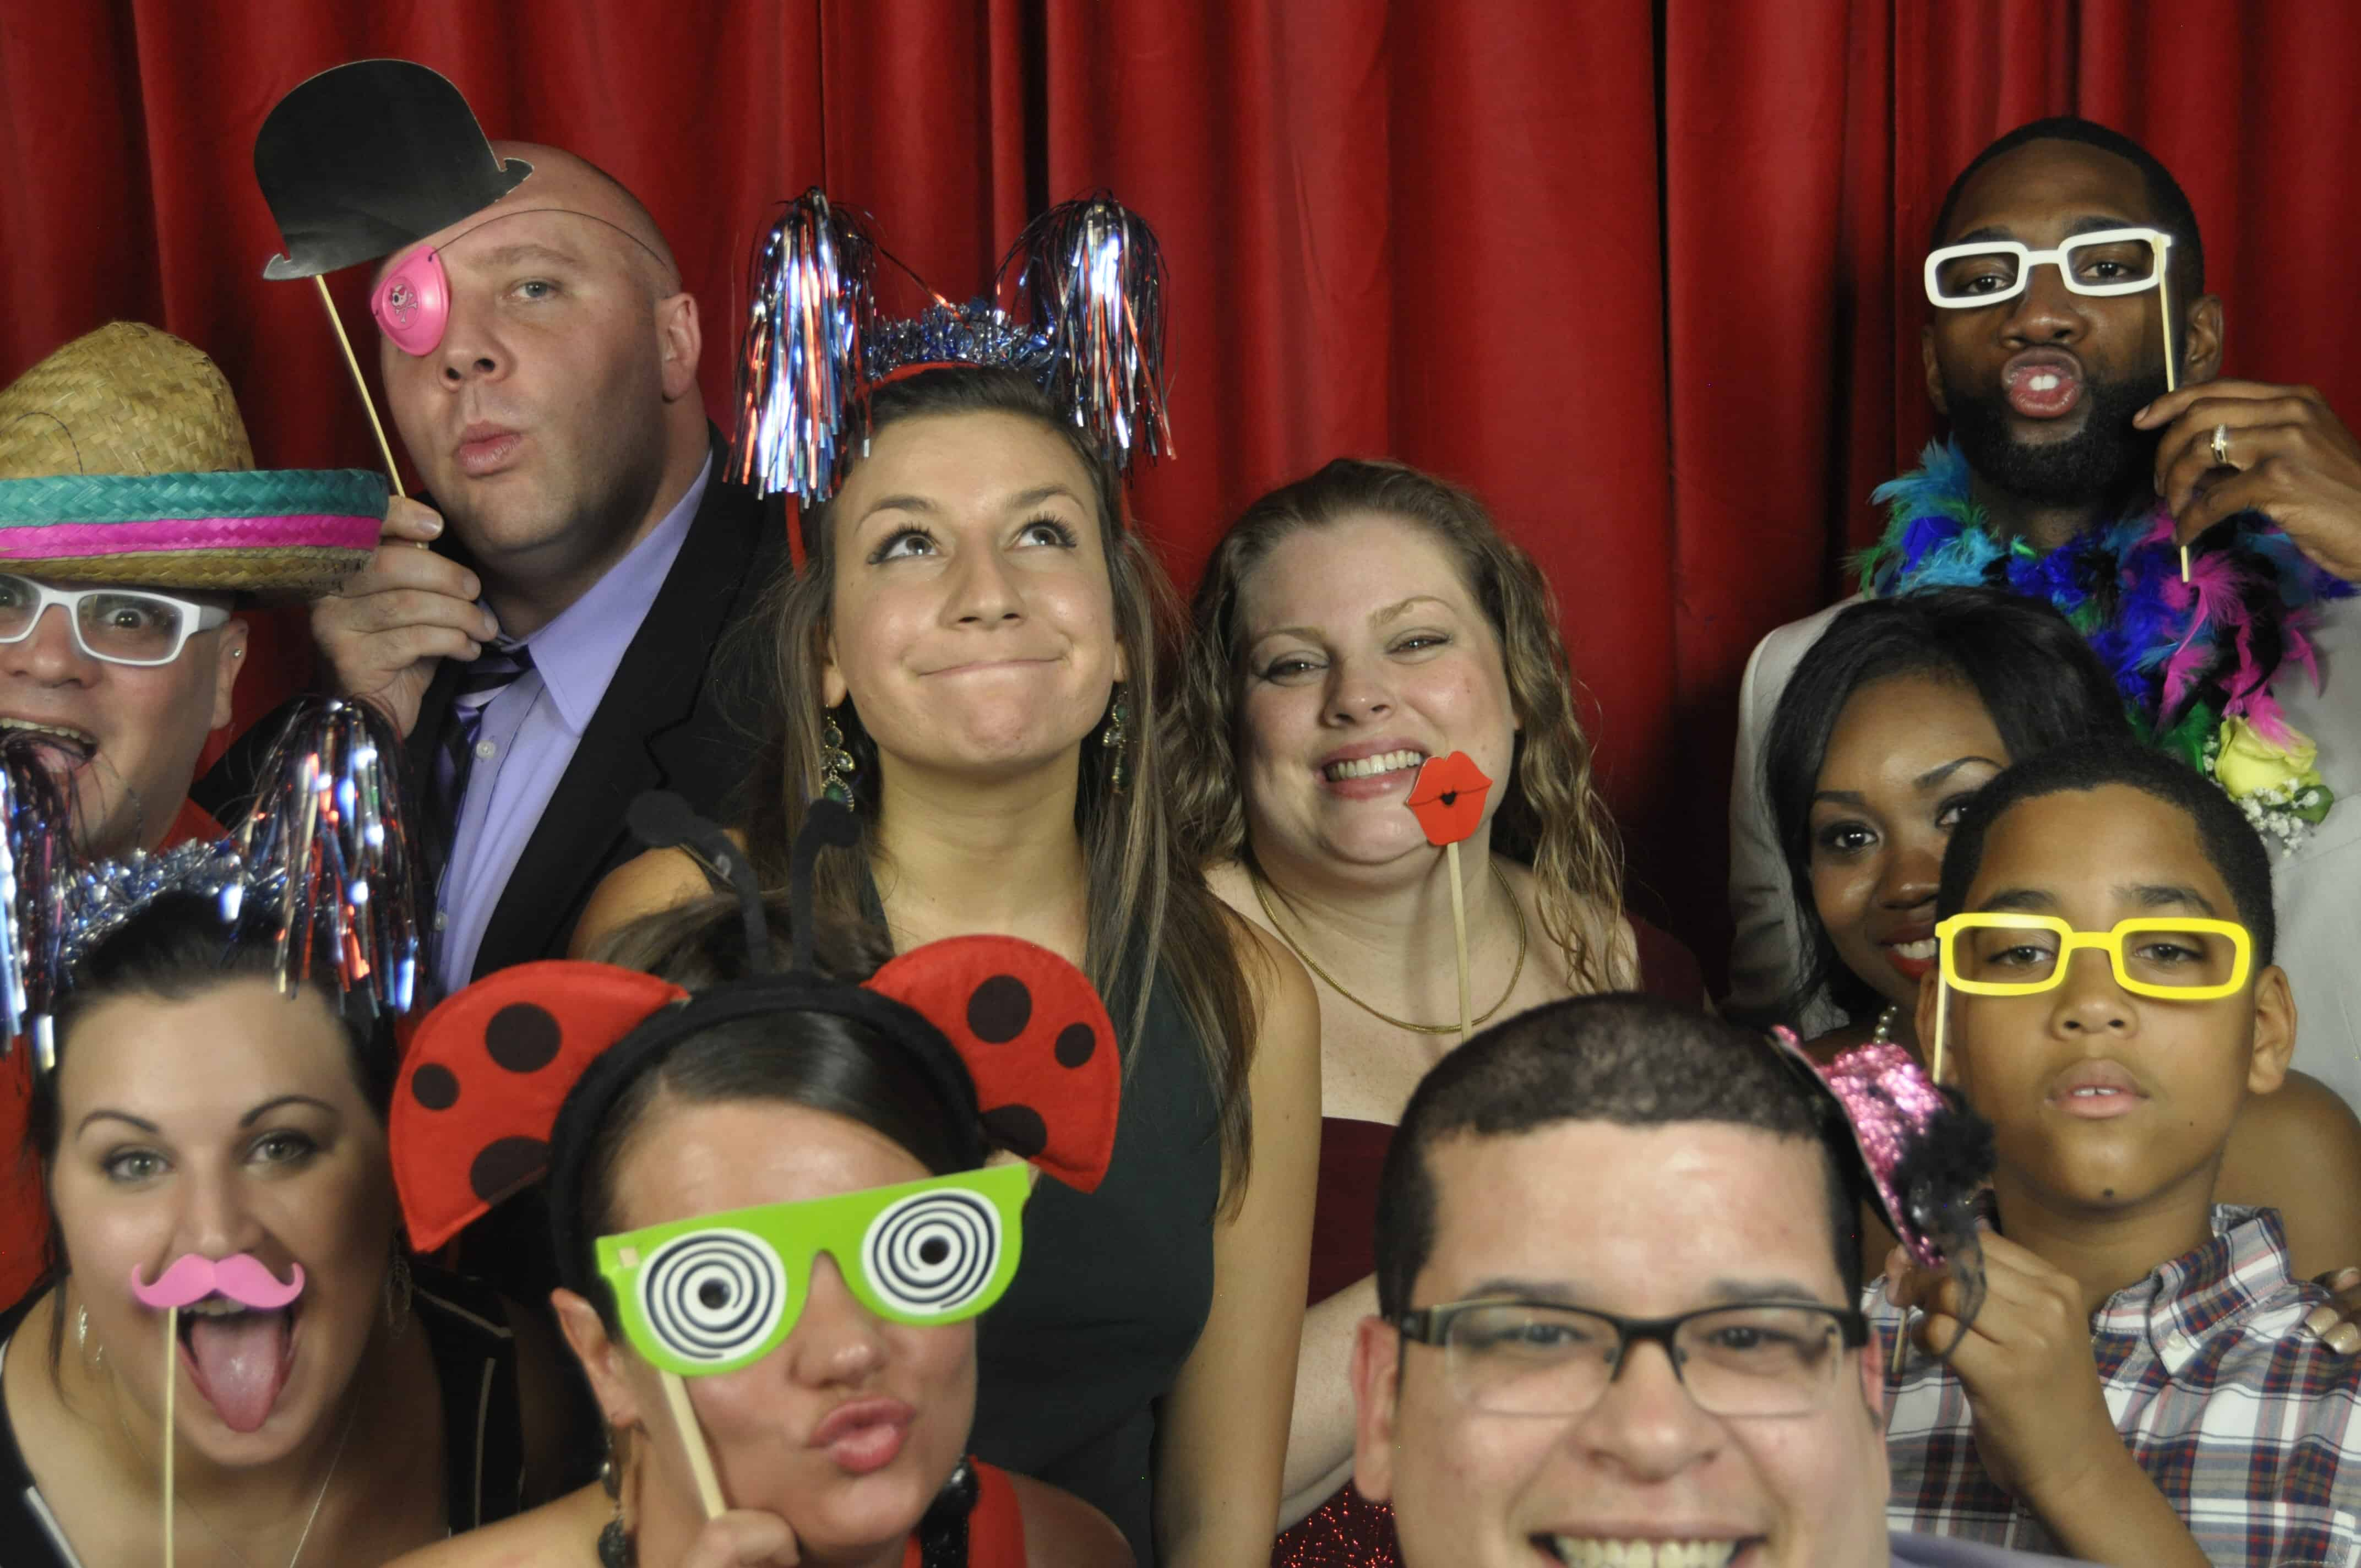 Orlando Wedding Photo booth rental